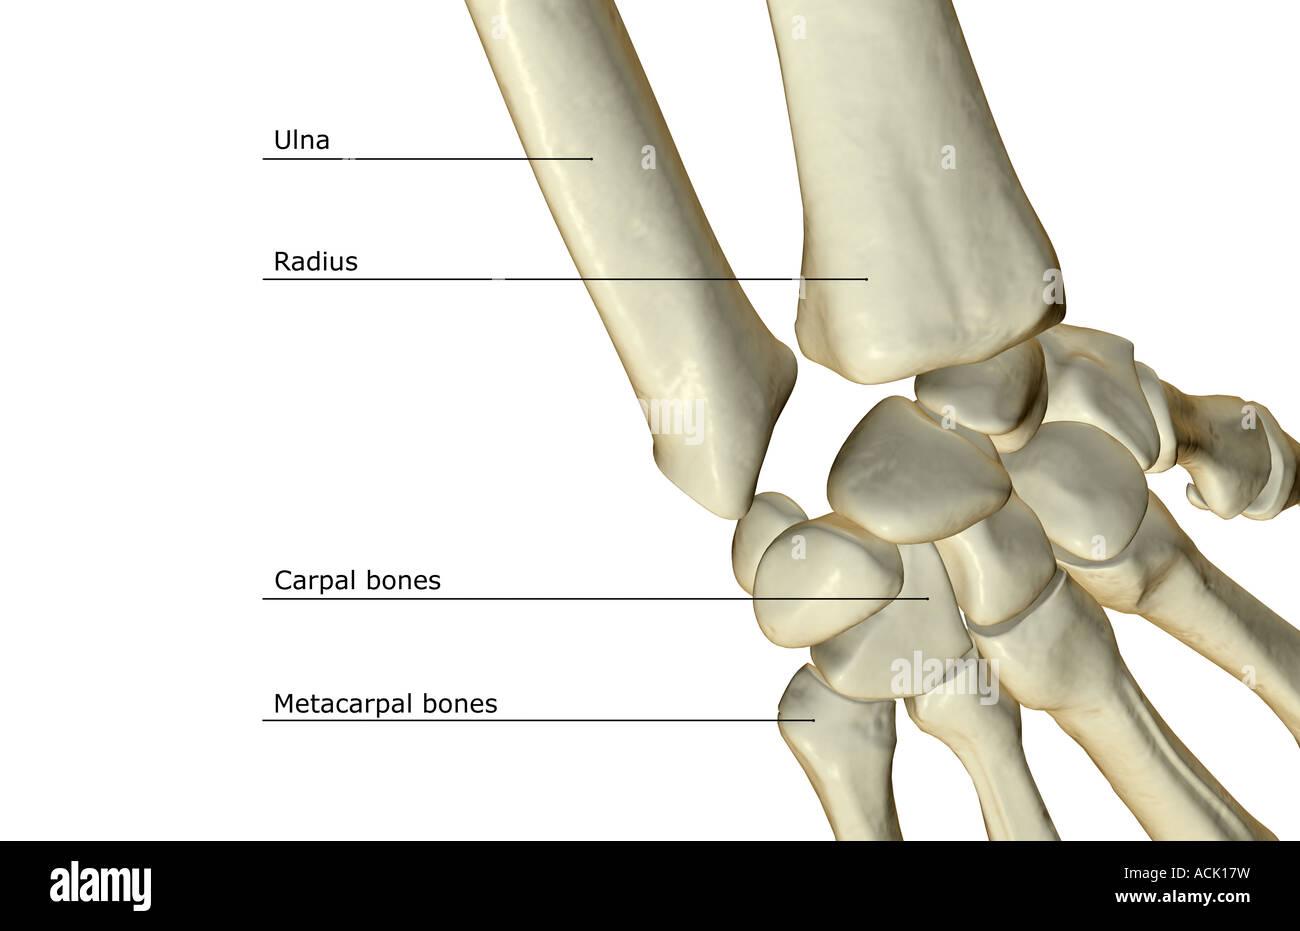 Wrist Bones Stock Photos & Wrist Bones Stock Images - Alamy